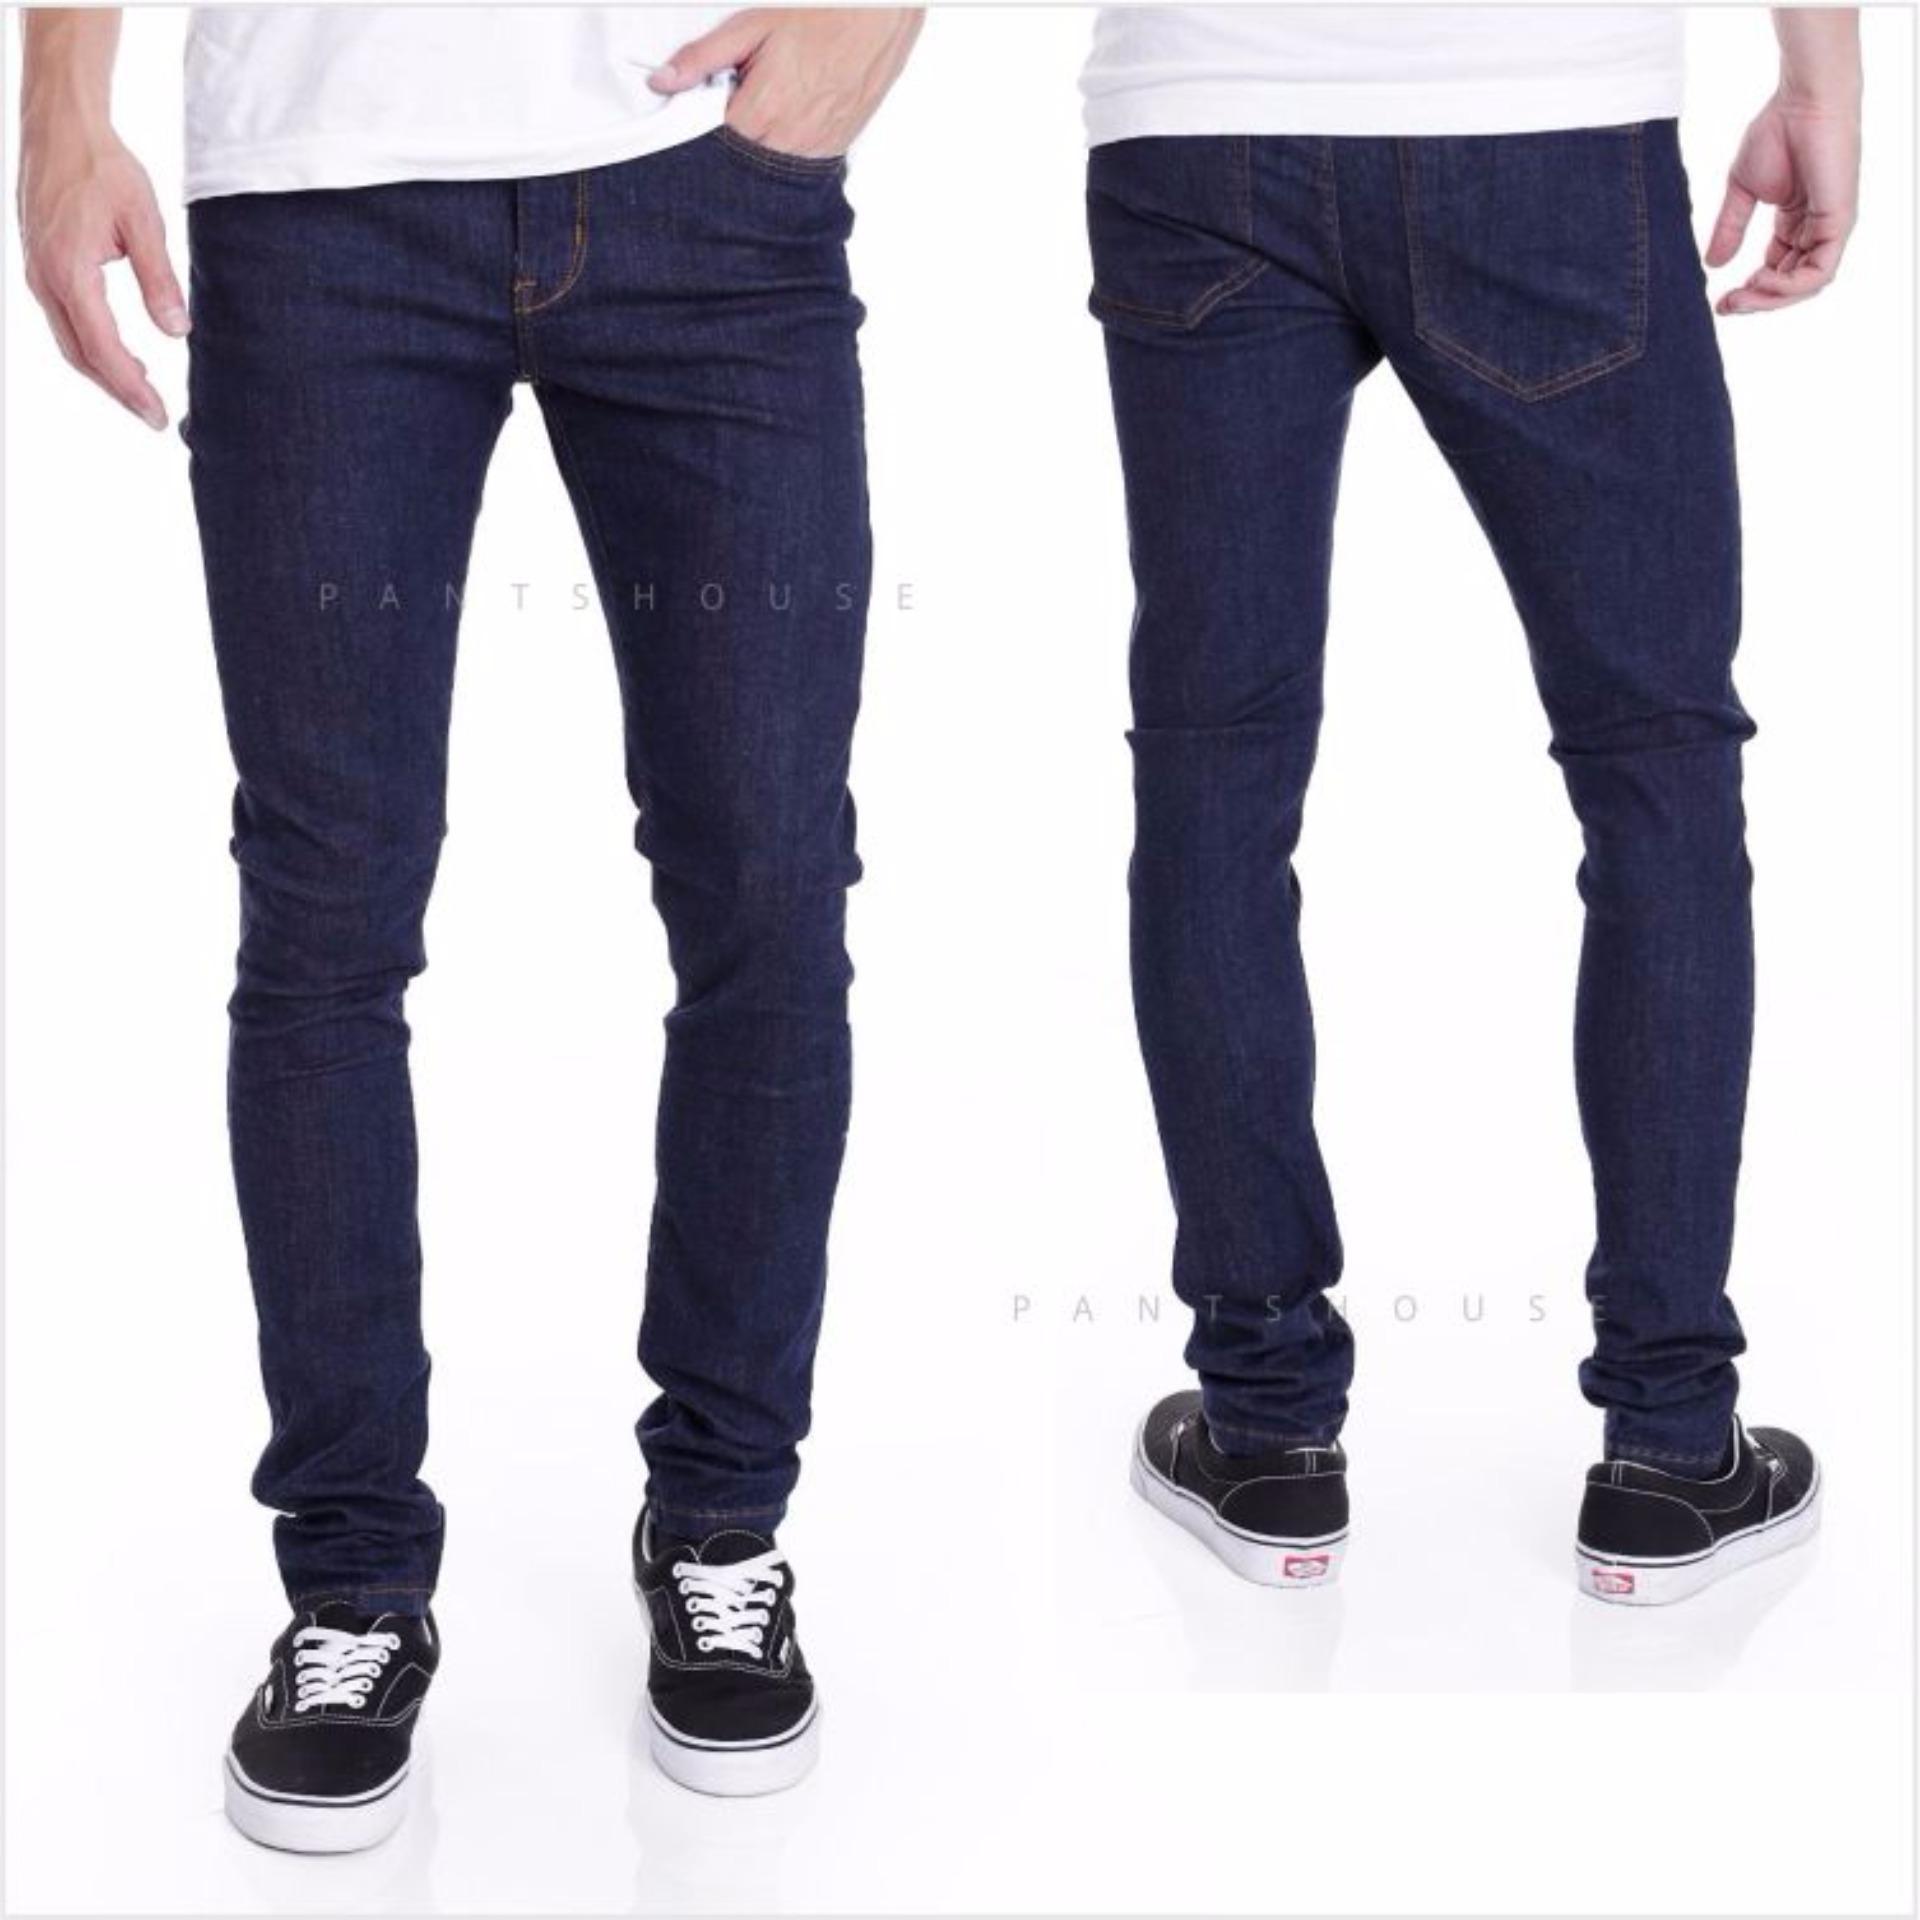 Dimana Beli Id Celana Jeans Skyni Original Grade A Dnr